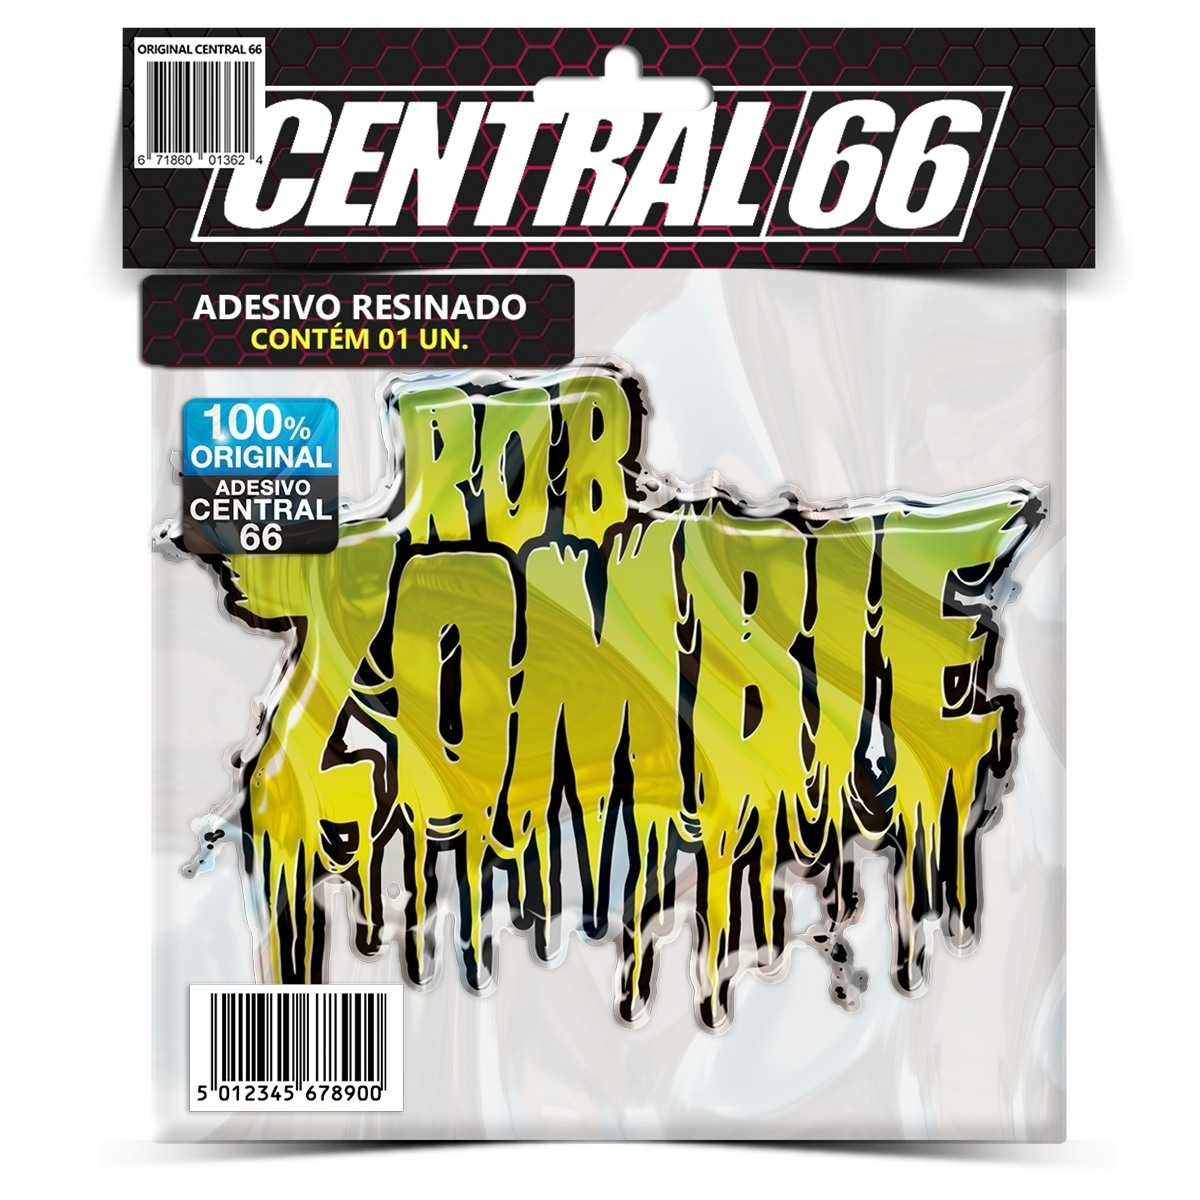 Adesivo Rob Zombie – Central 66